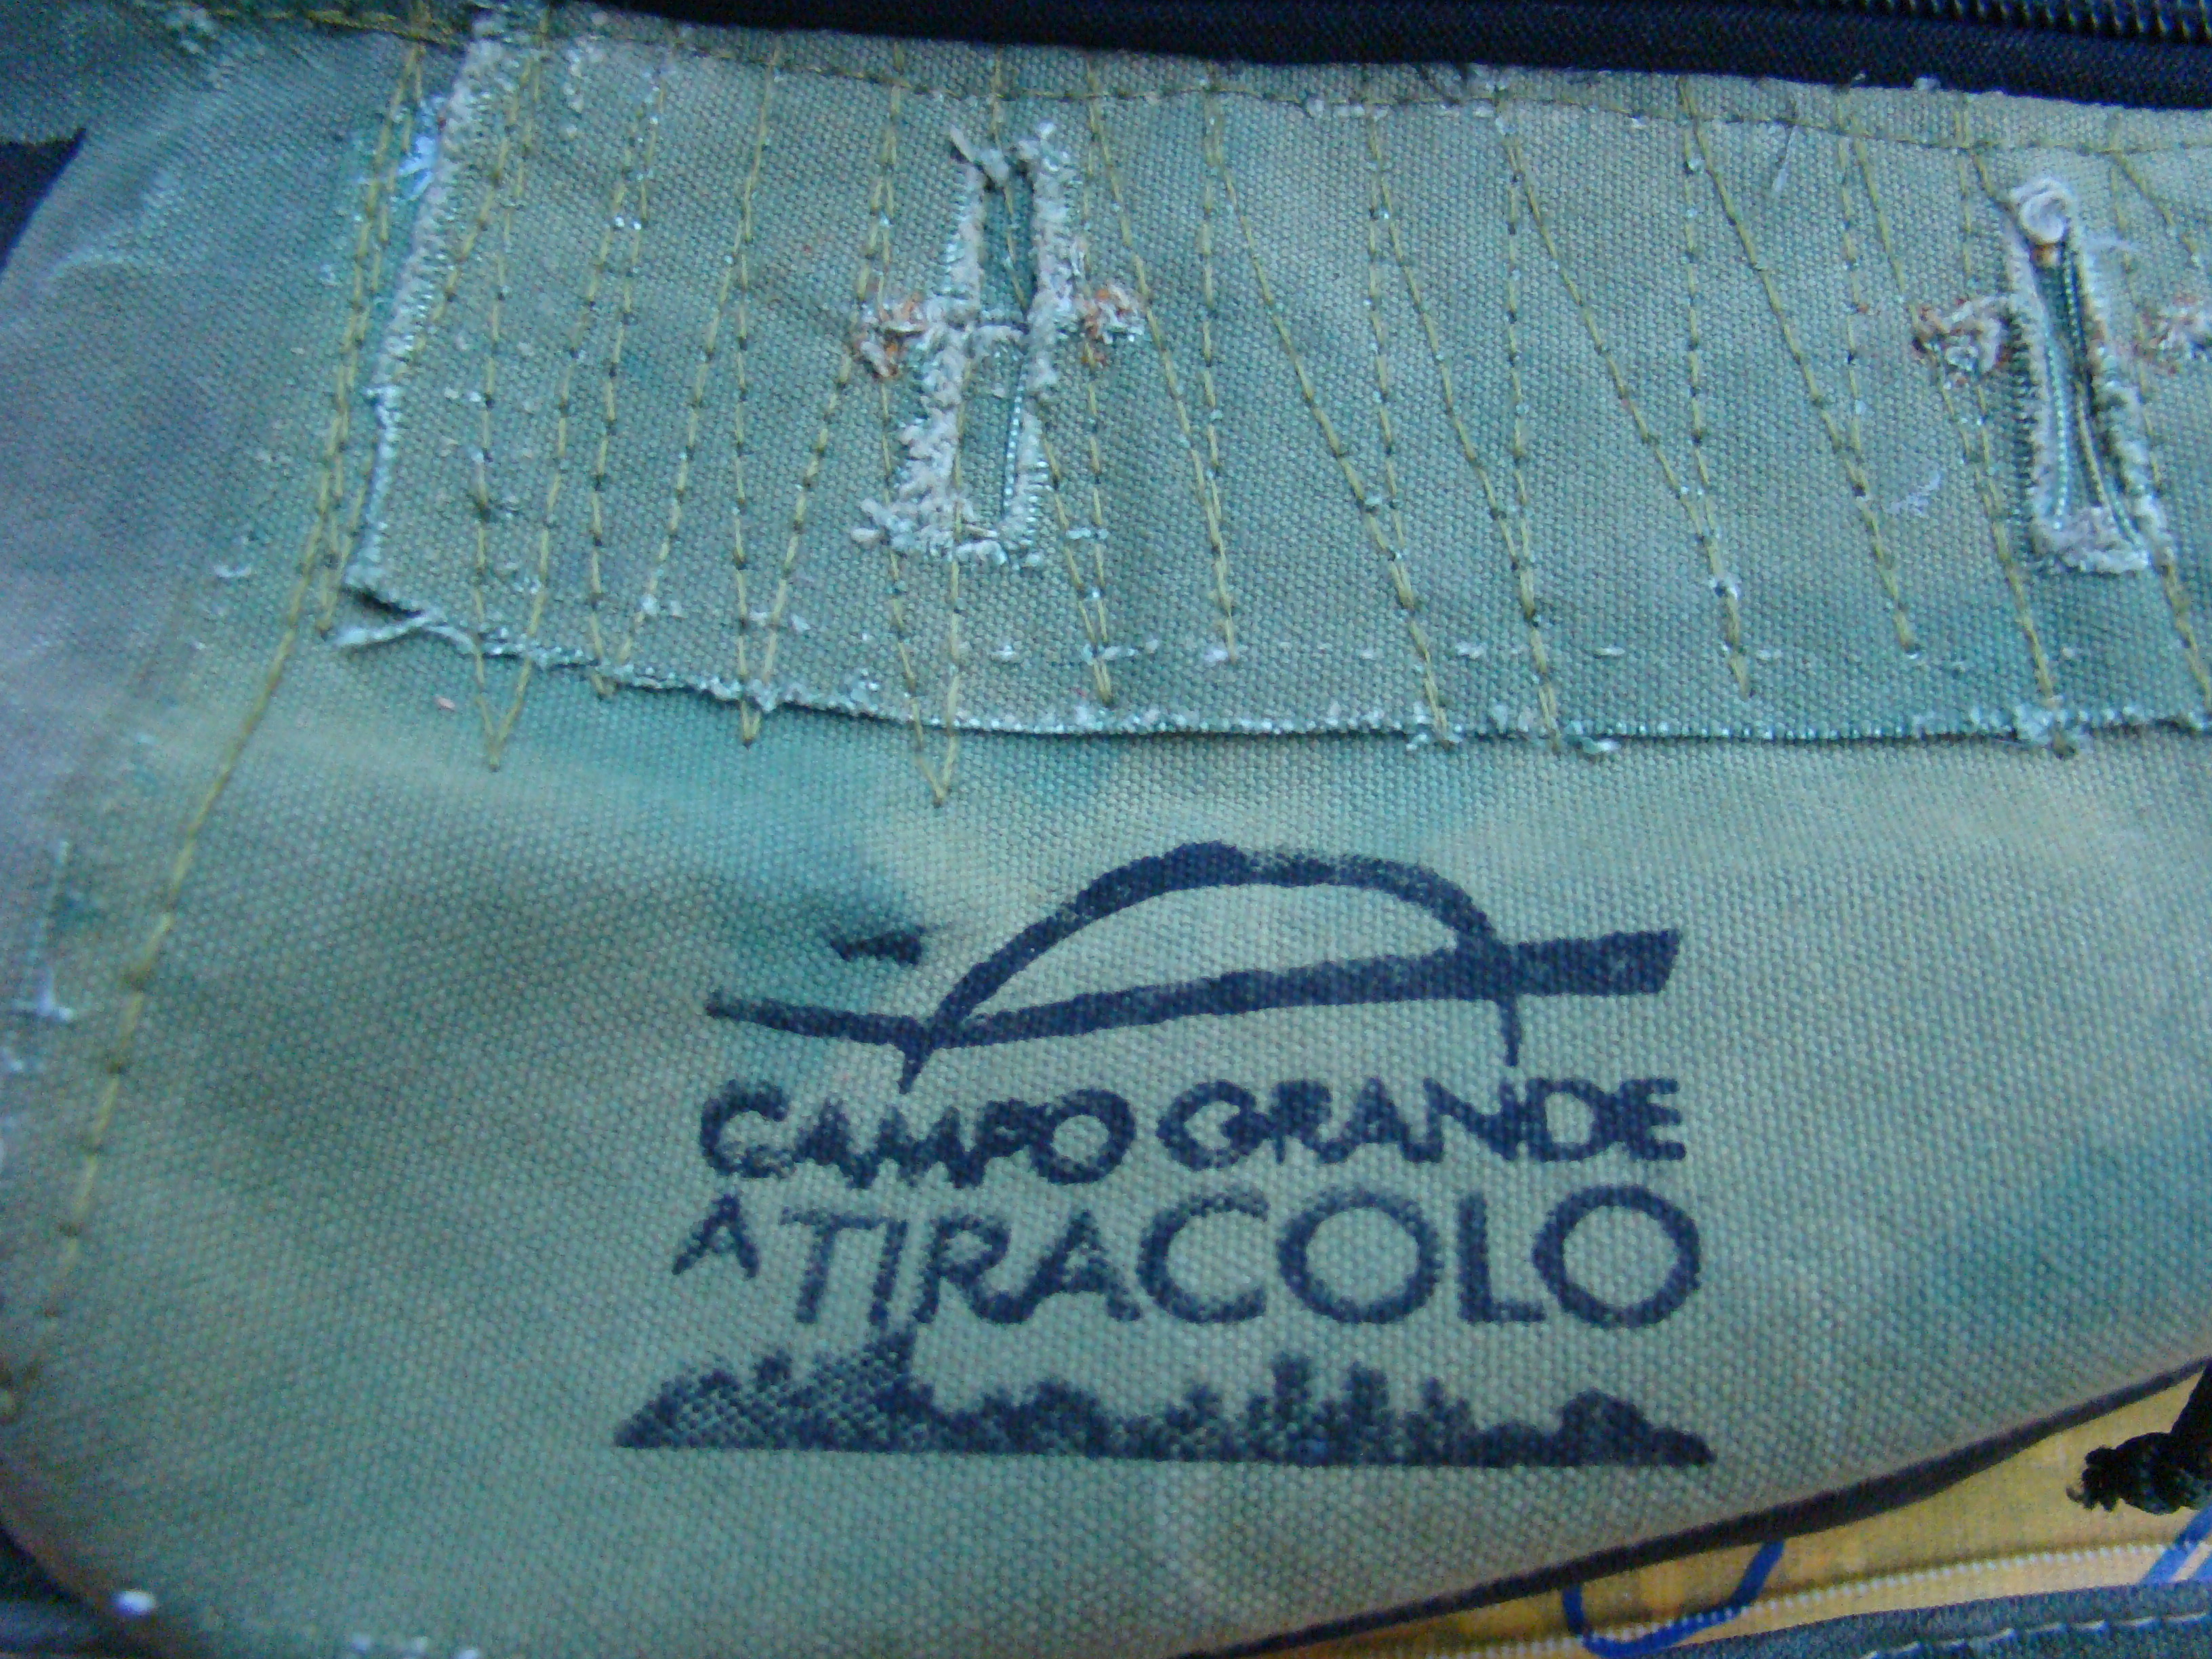 Carimbo logo